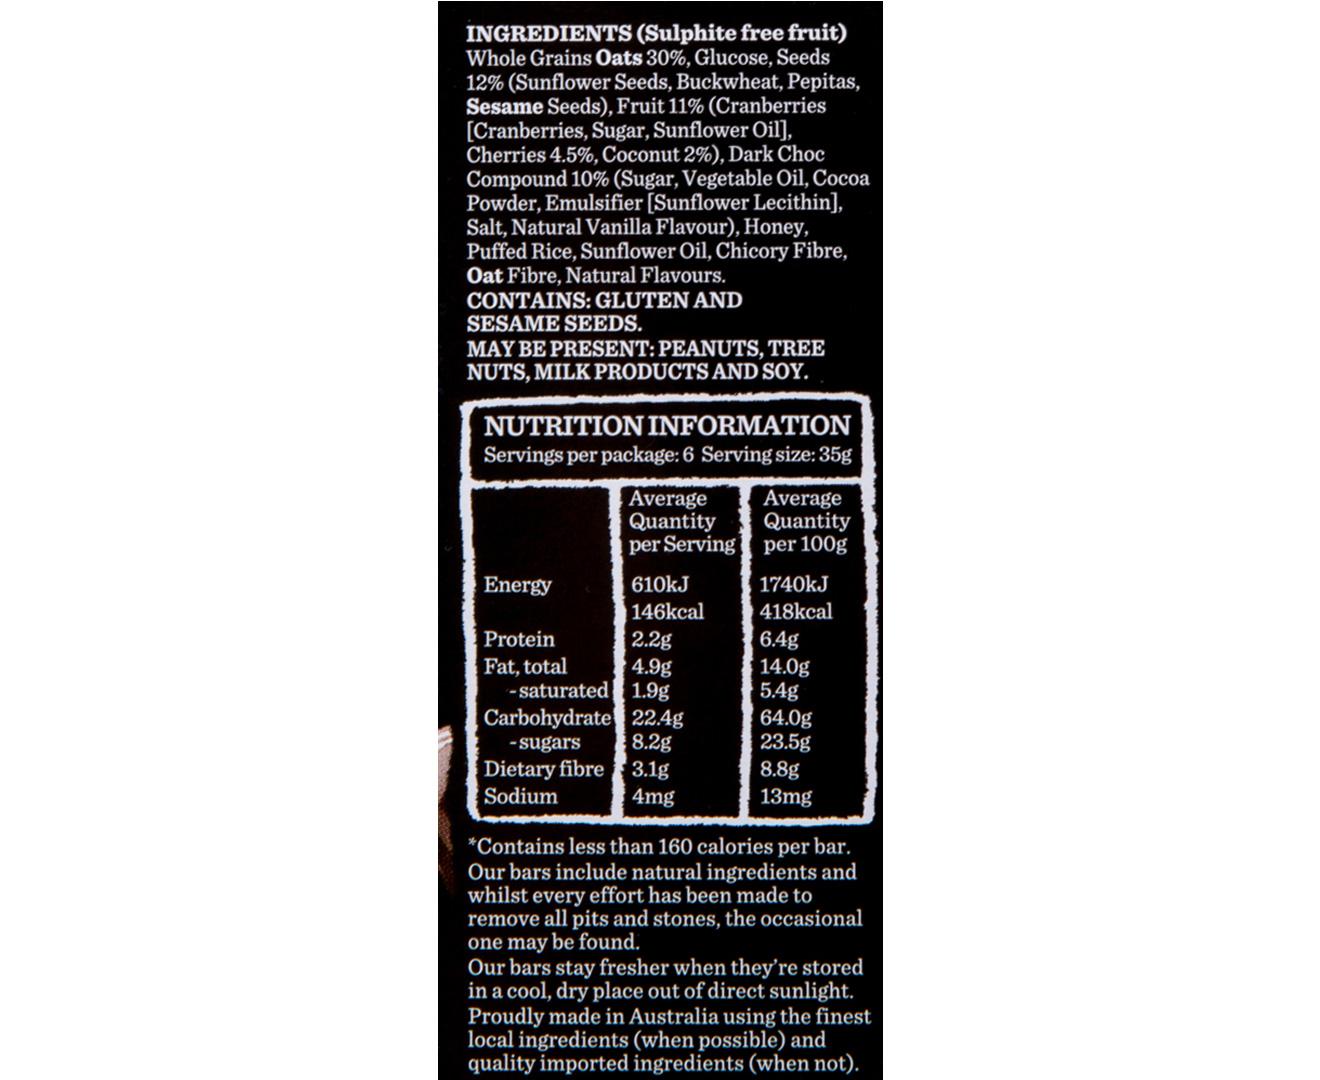 Details about 3 x Carman's Dark Choc, Cherry & Coconut Bars 210g 6pk